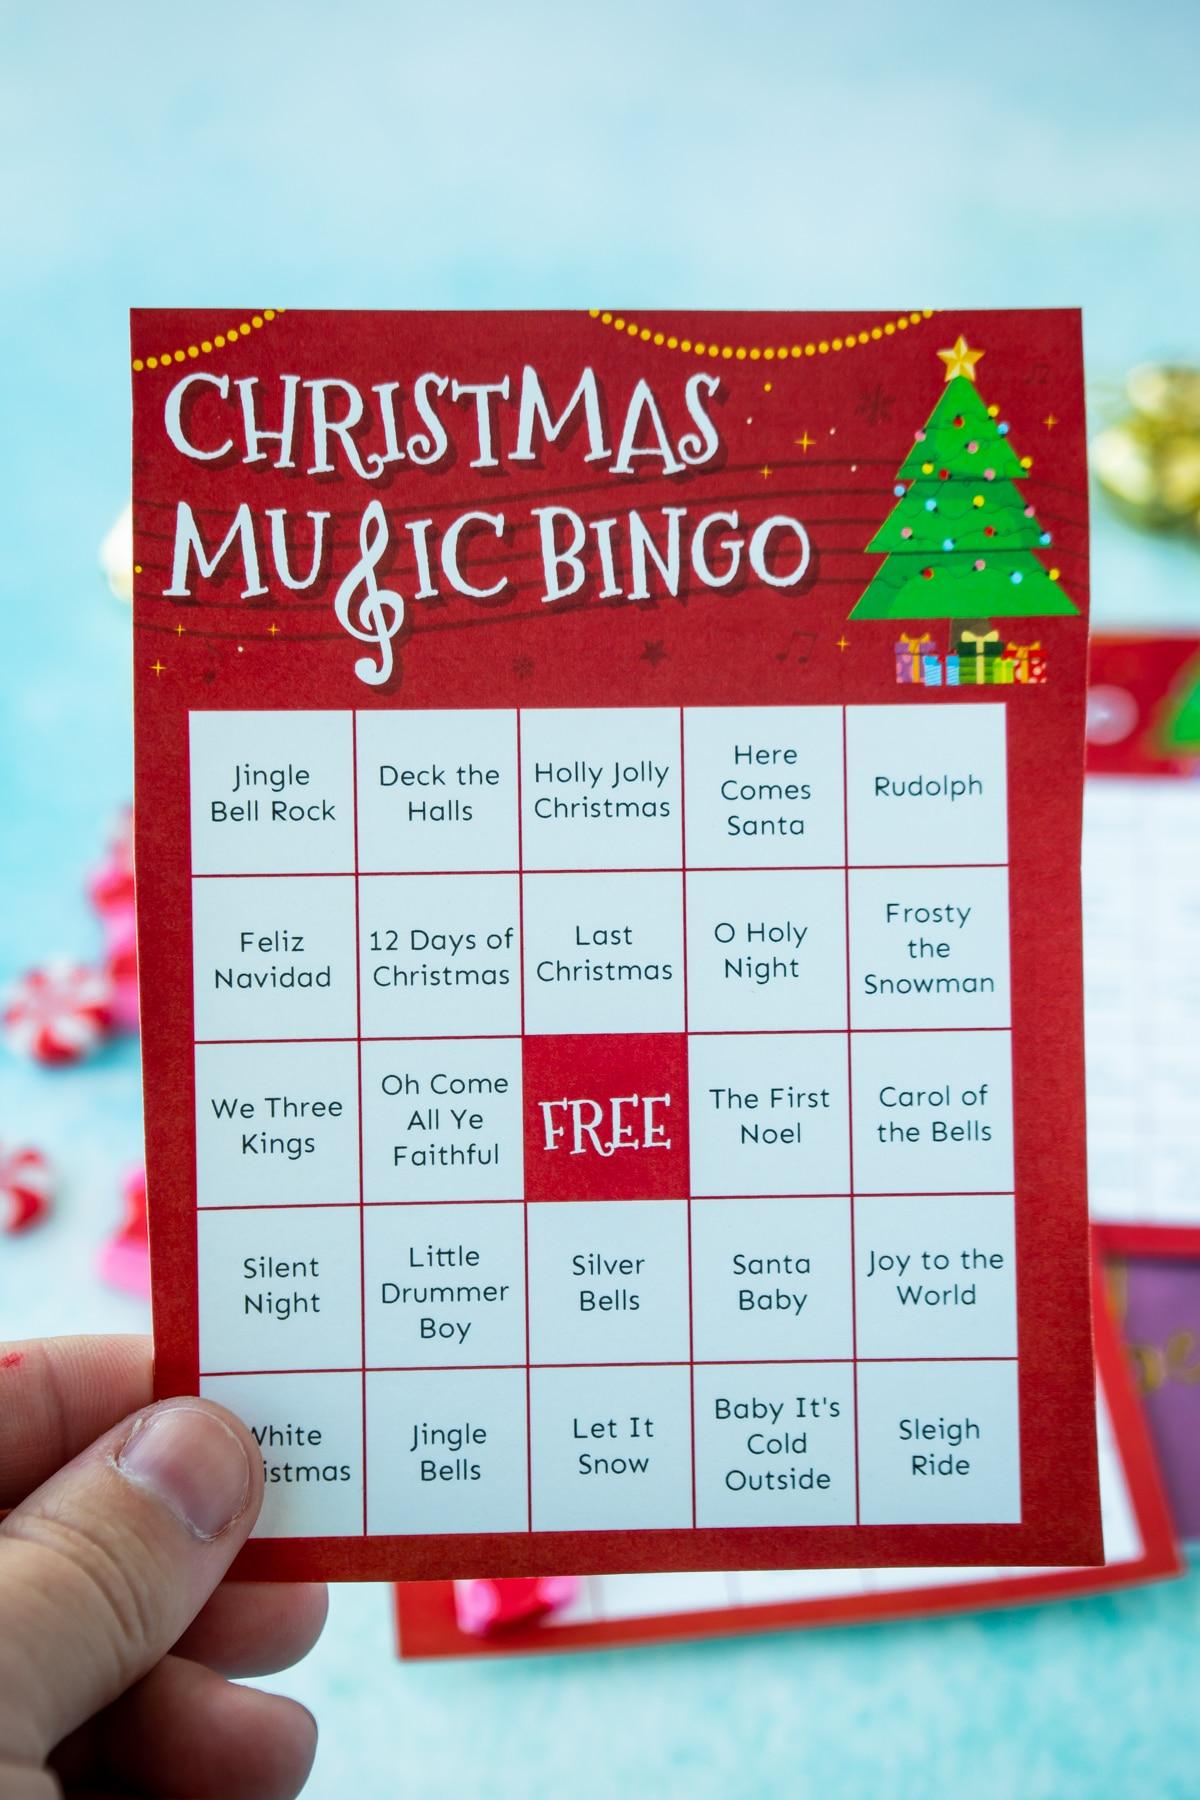 Hand holding a Christmas music bingo card